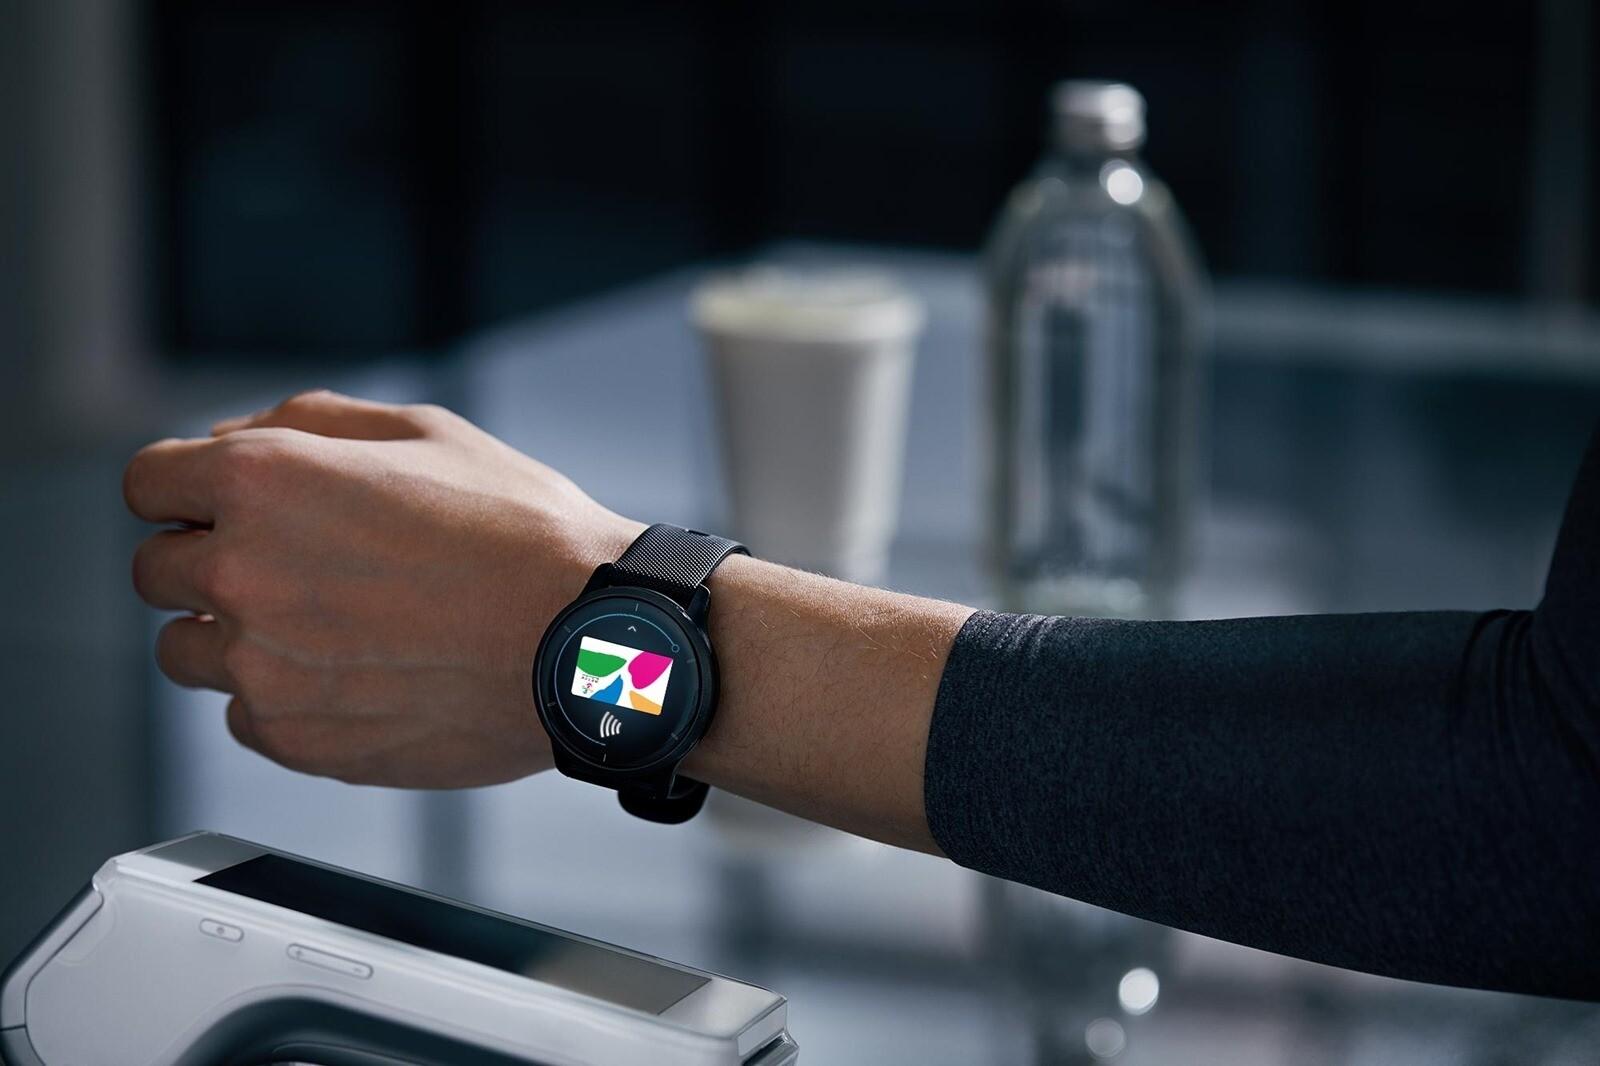 「VENU-2 系列 GPS 智慧腕錶」內建多項智慧提示、悠遊卡及 Garmin-Pay 行動支付,減少接觸風險、保護大家的健康,讓你輕鬆掌握健康便利又安全的生活_thumb.jpg @3C 達人廖阿輝